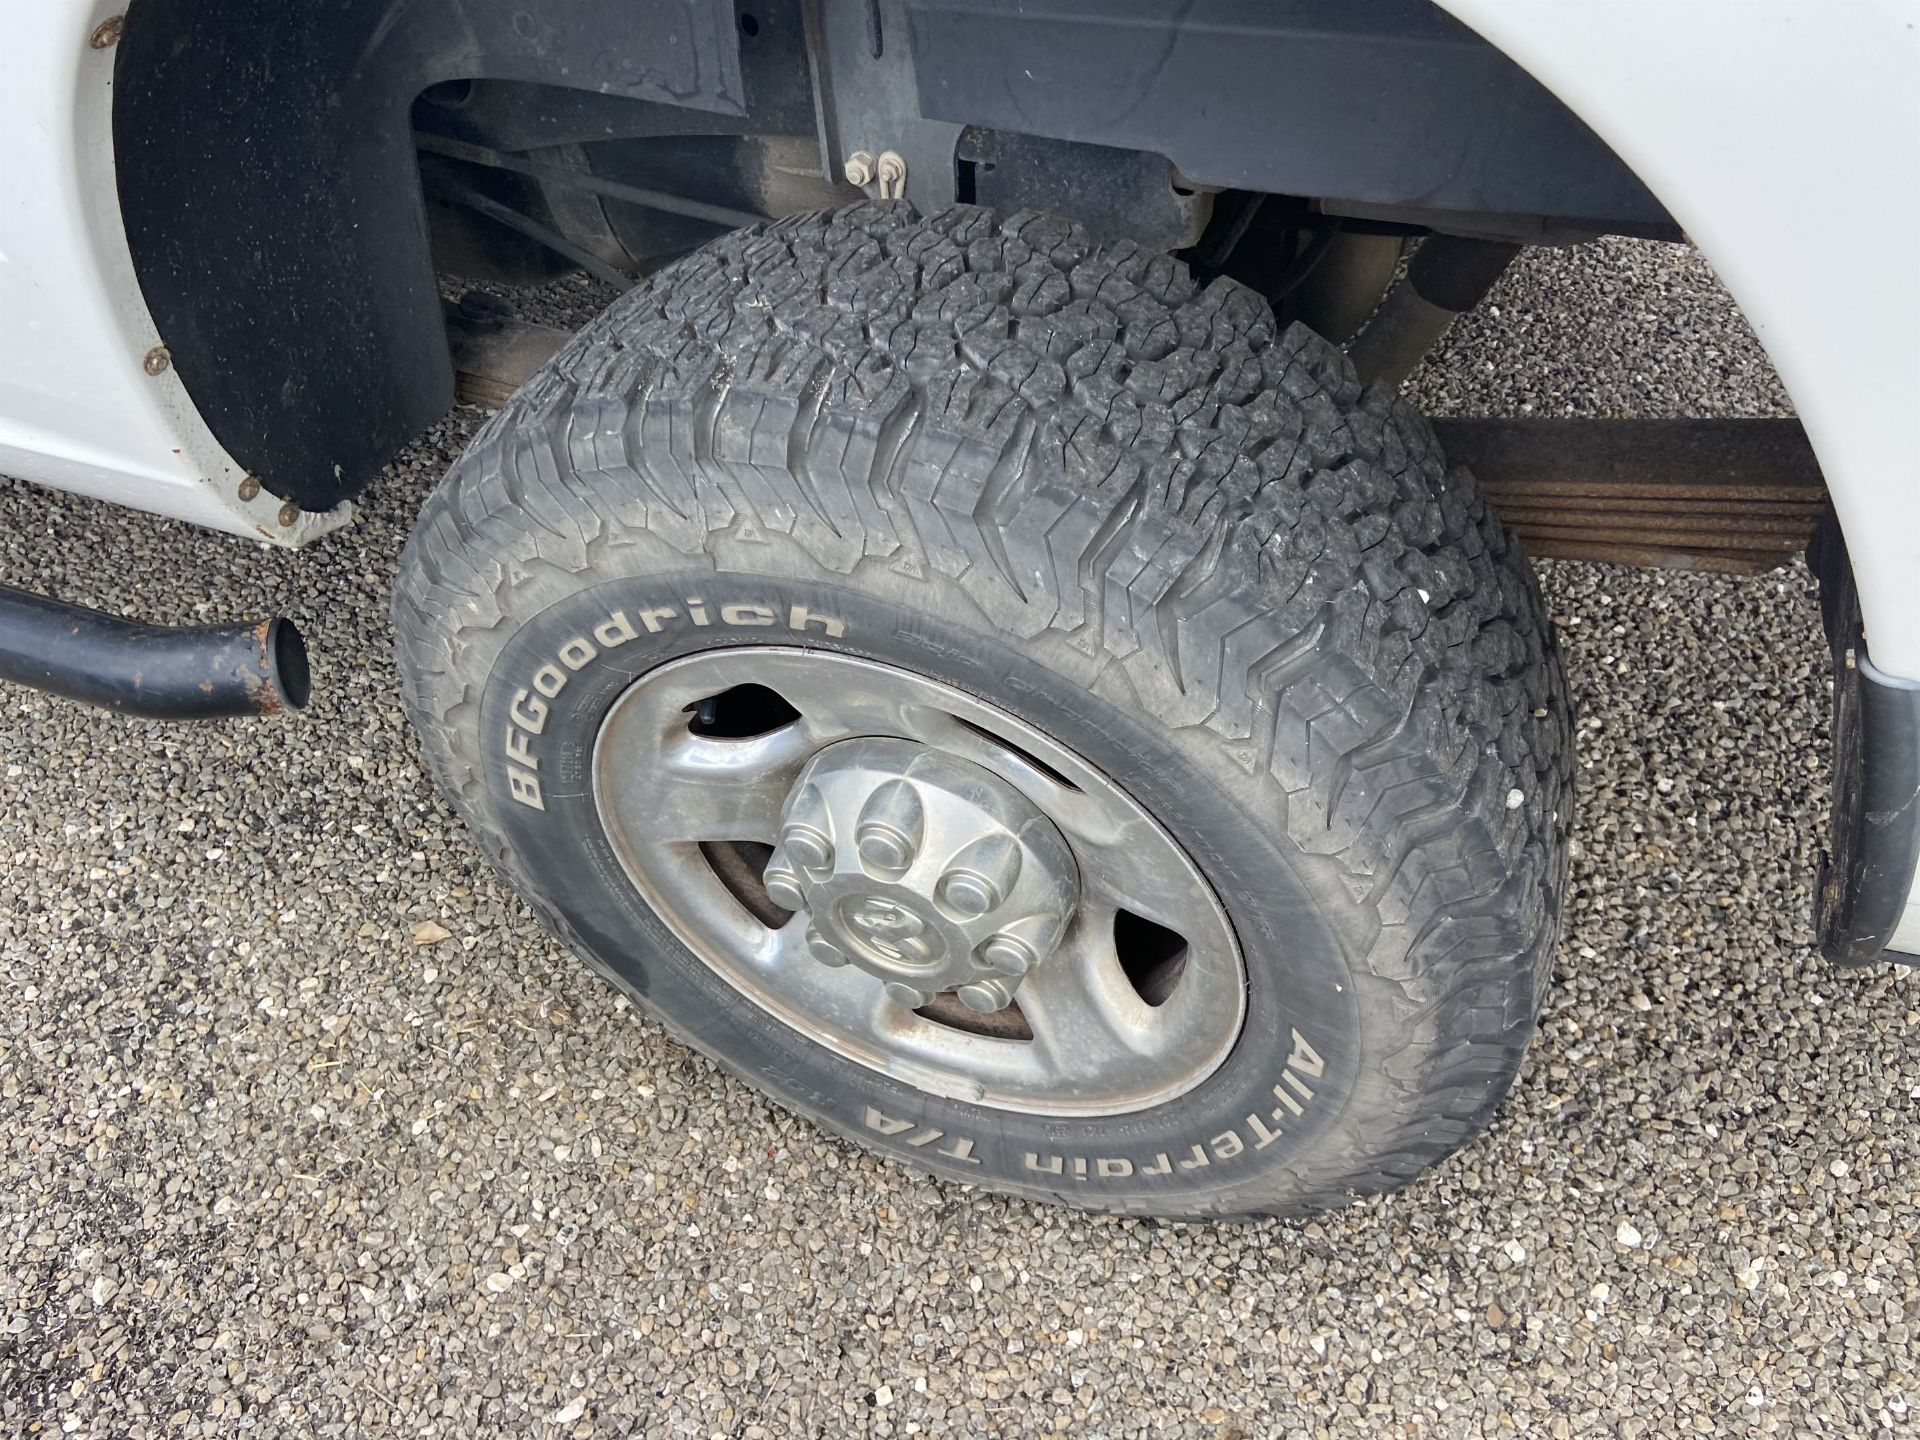 2011 Dodge Ram 2500 HD Crew Cab Long Bed, 212k Miles, Vinyl, 4x4, Gas, VIN # 3D7TT2CT9BG626009 - Image 5 of 16